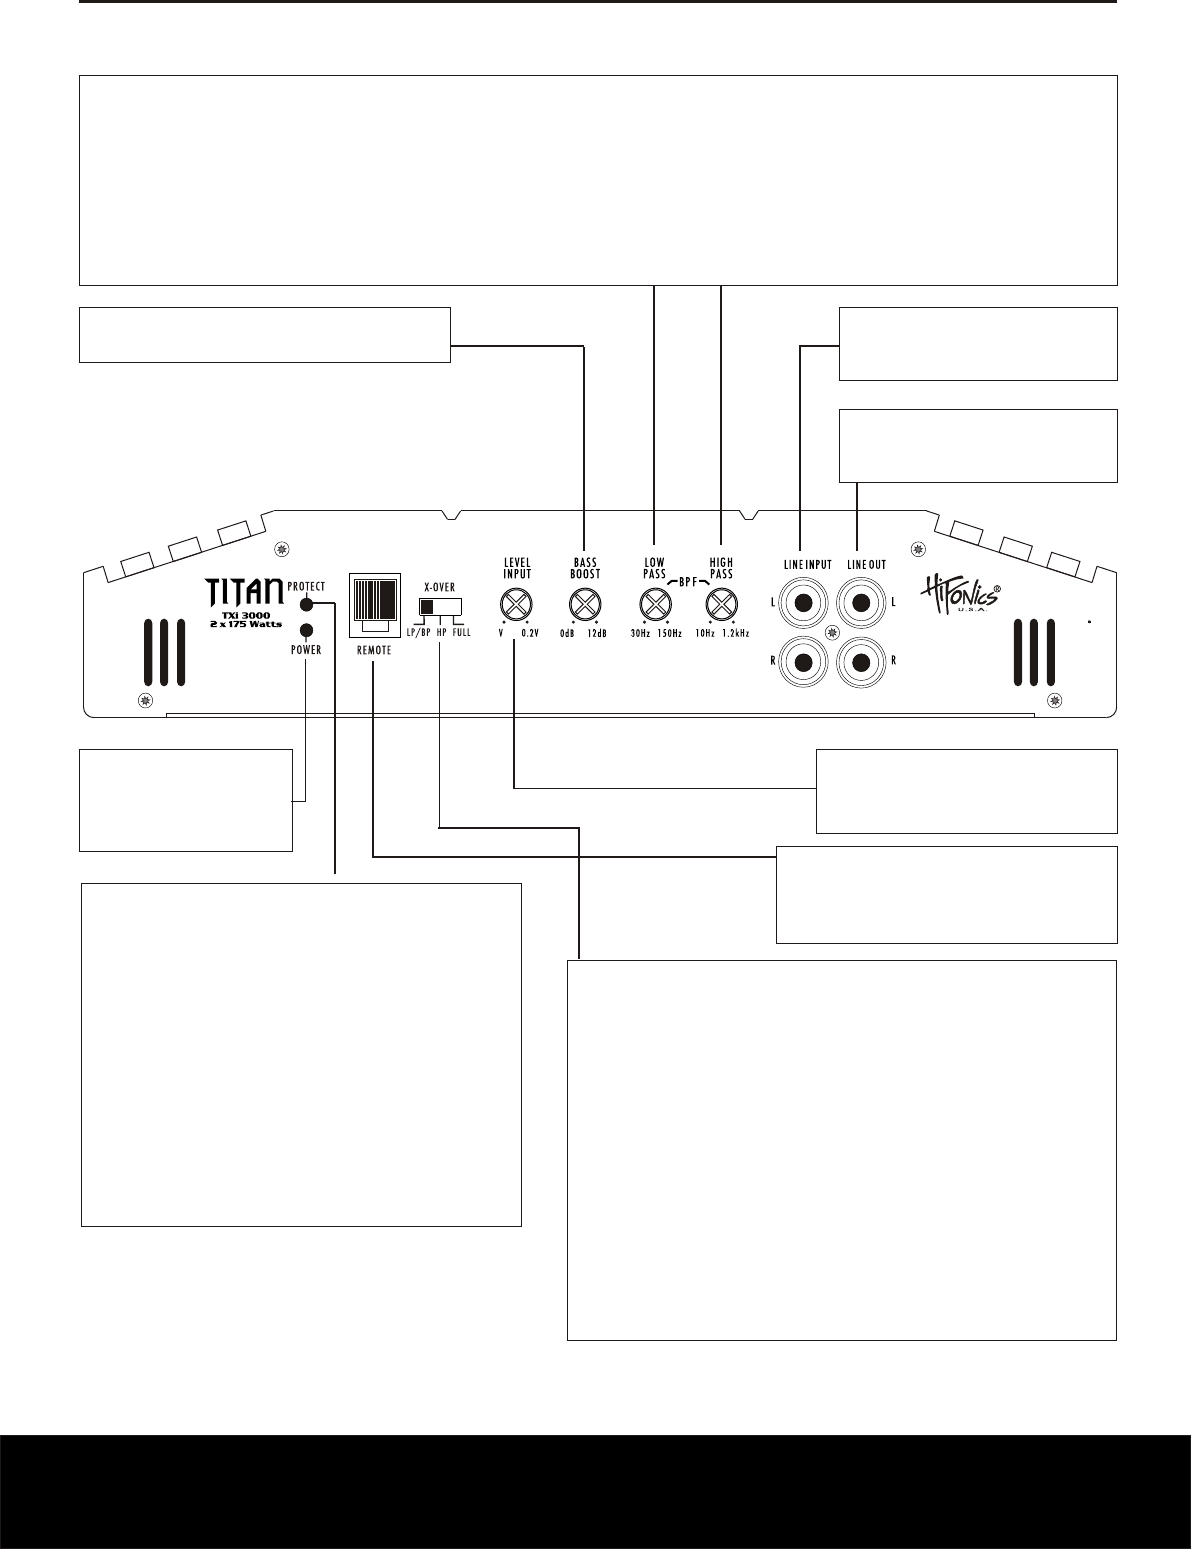 Handleiding Hifonics Txi3400 Pagina 15 Van 24 Deutsch English Amp Wiring Diagram